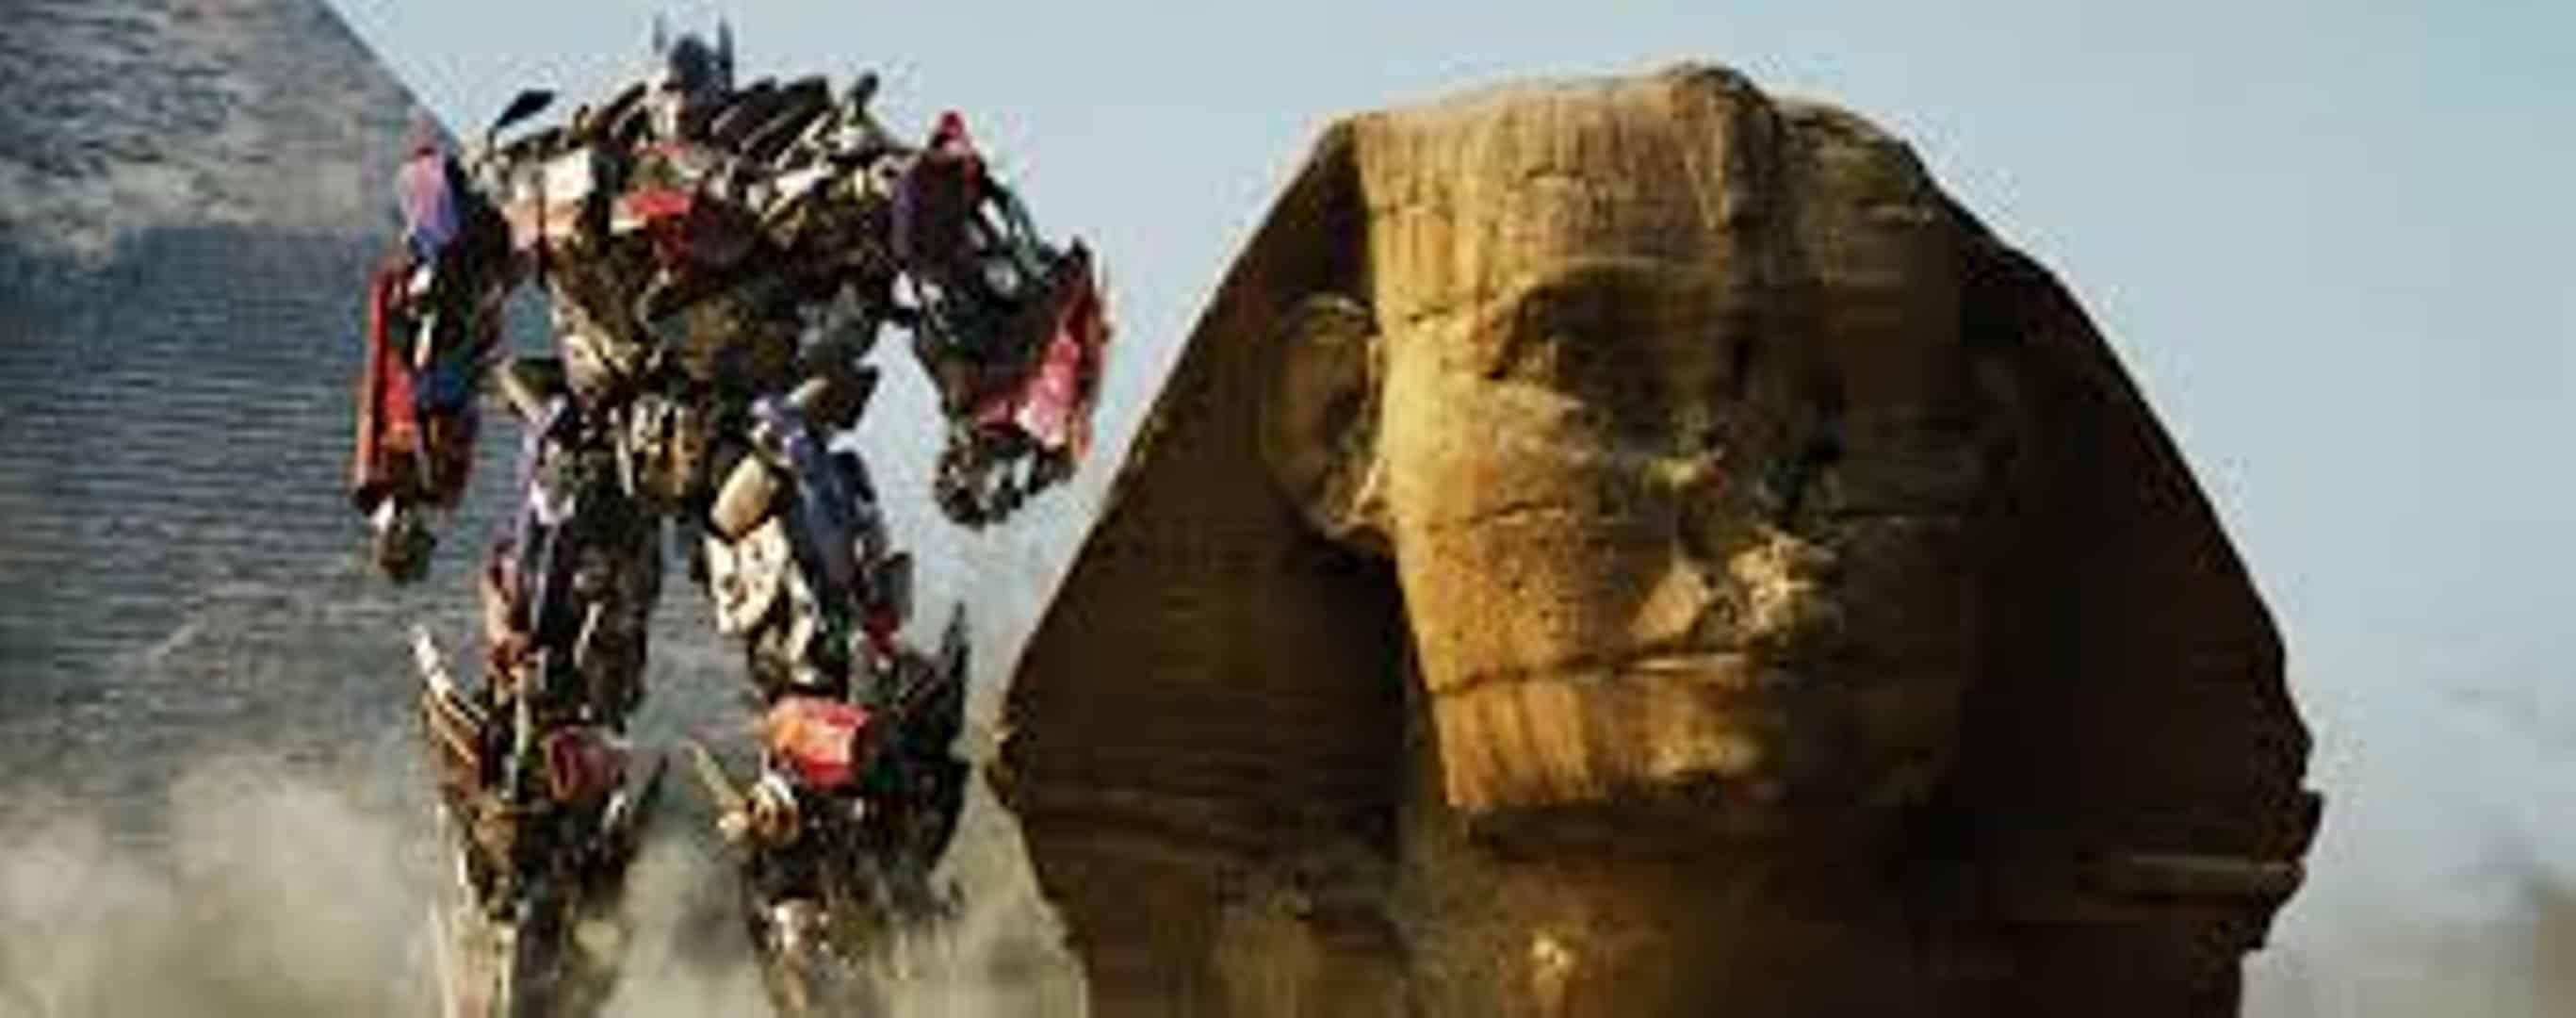 transformers 2 4 - نقد فیلم ضد امام زمانی تبدیل شوندگان ۲